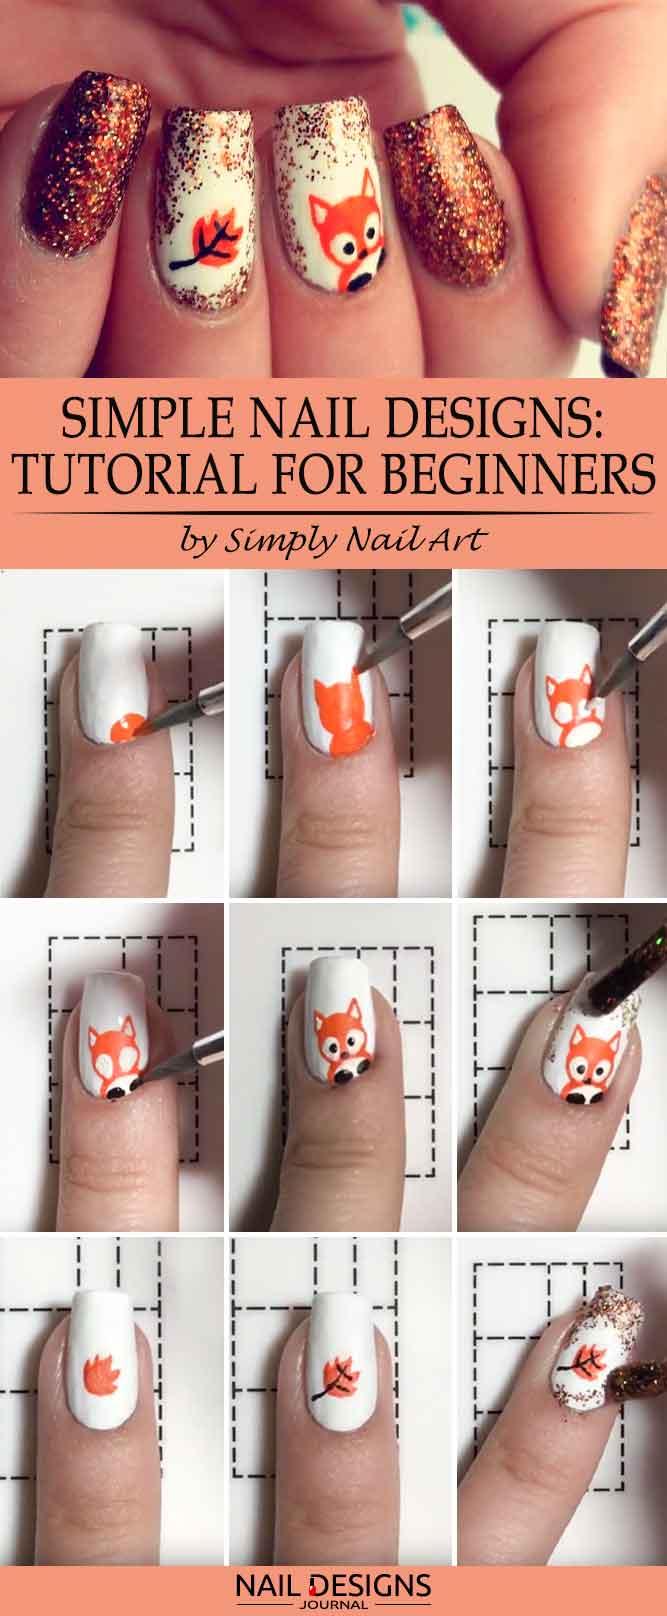 3 Foxy Nails Ideas To Make Everyone Crazy | NailDesignsJournal.com